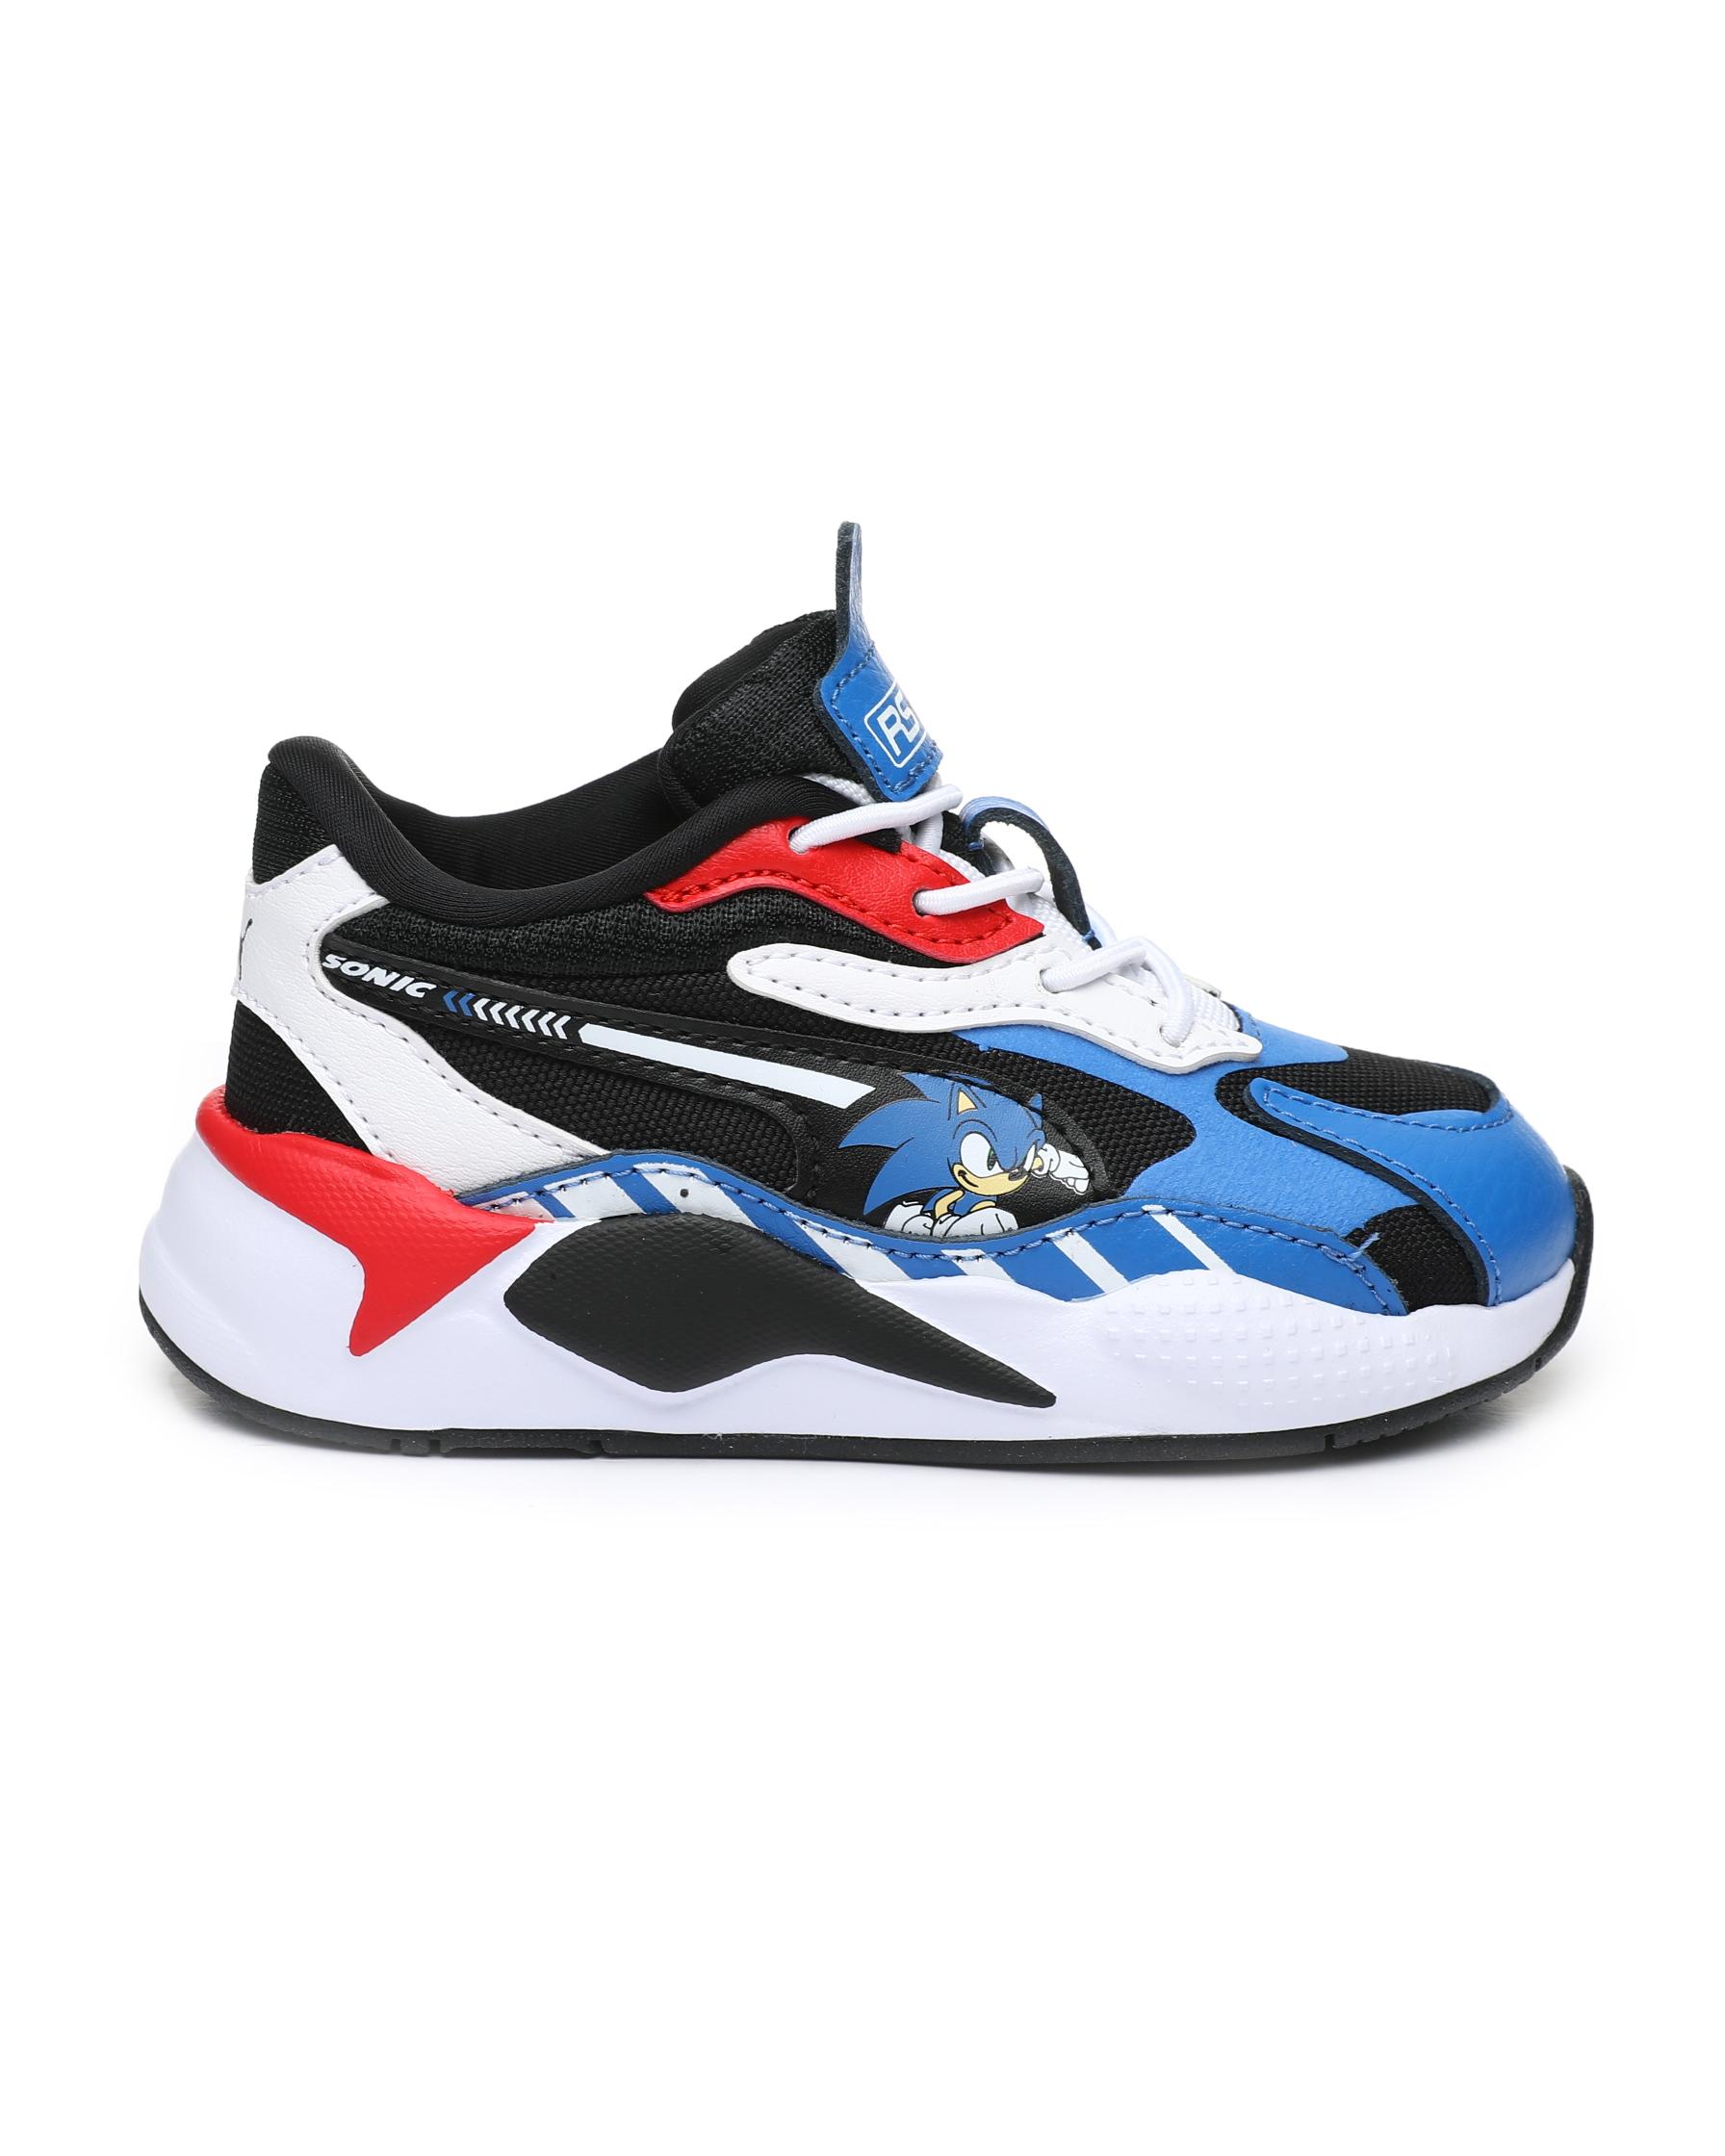 Buy Puma x Sega RS-X3 Sonic Sneakers (4-10) Boys Footwear ...